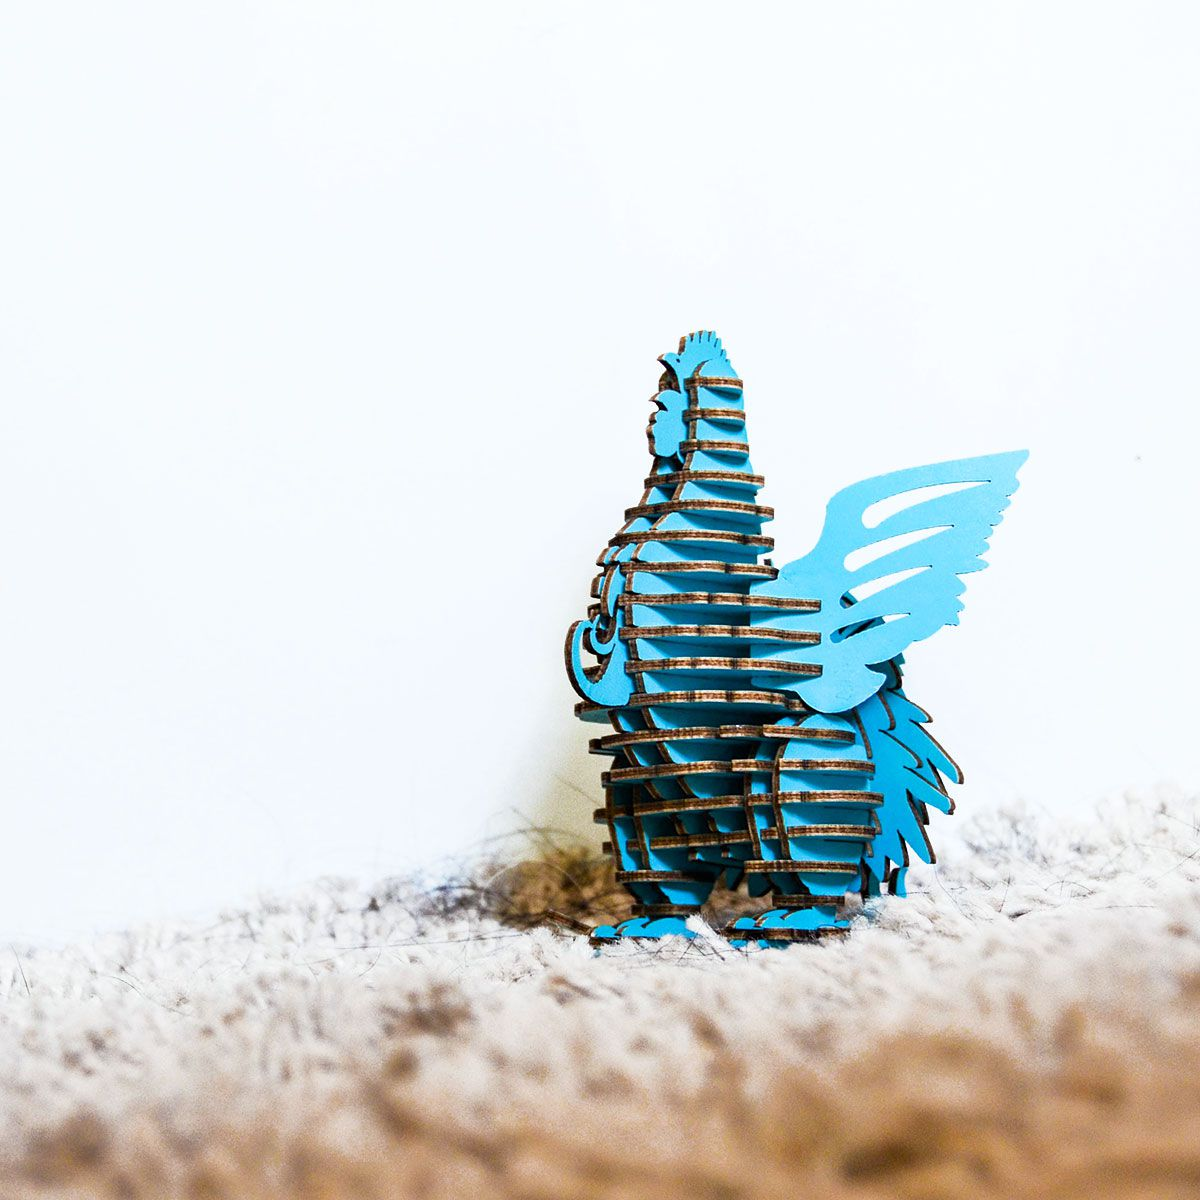 TENONART 布萊梅城市樂手 雞 (藍/未組裝)